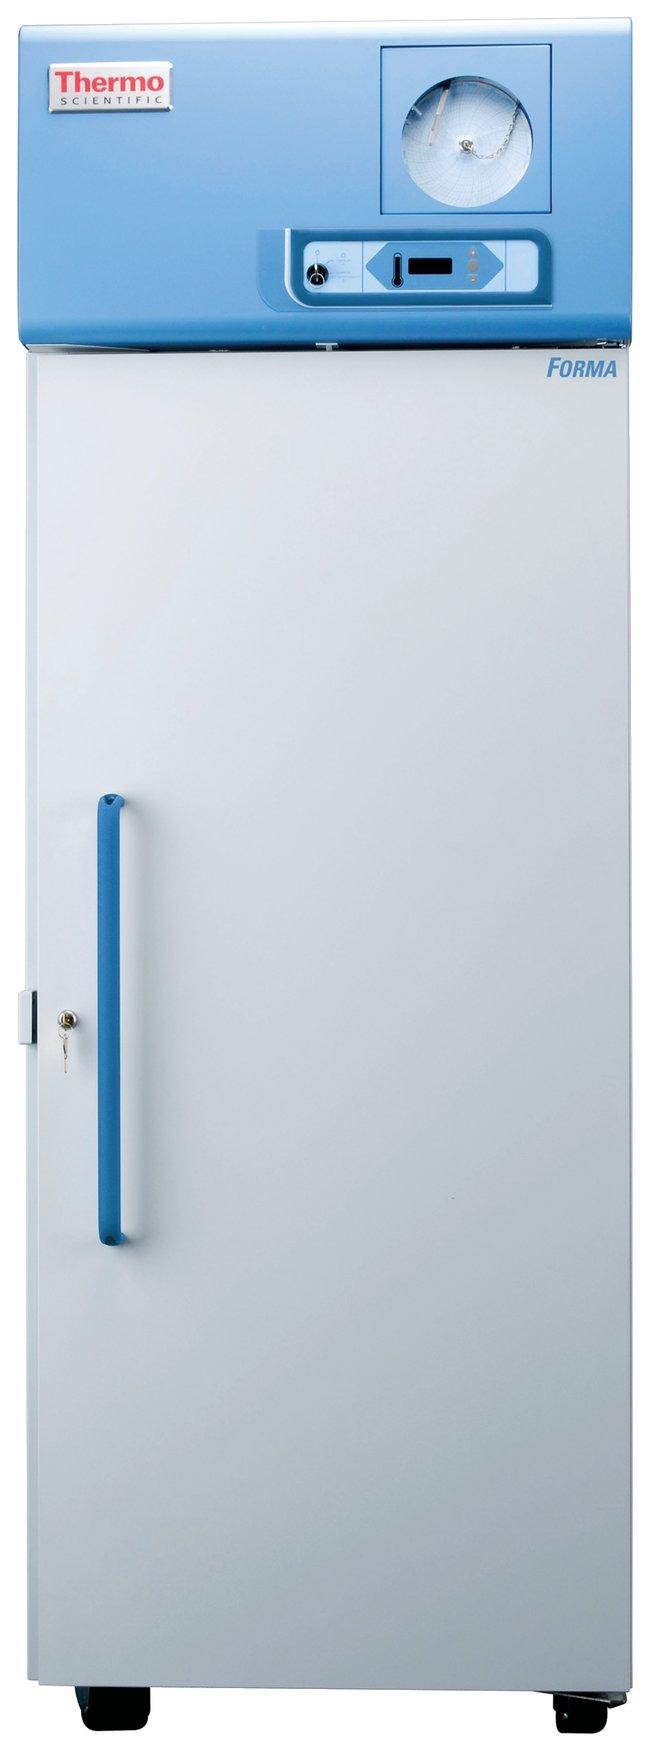 Forma scientific freezer manualvwr revco lab freezer 13411 thermo scientific forma high performance lab freezers home fandeluxe Choice Image